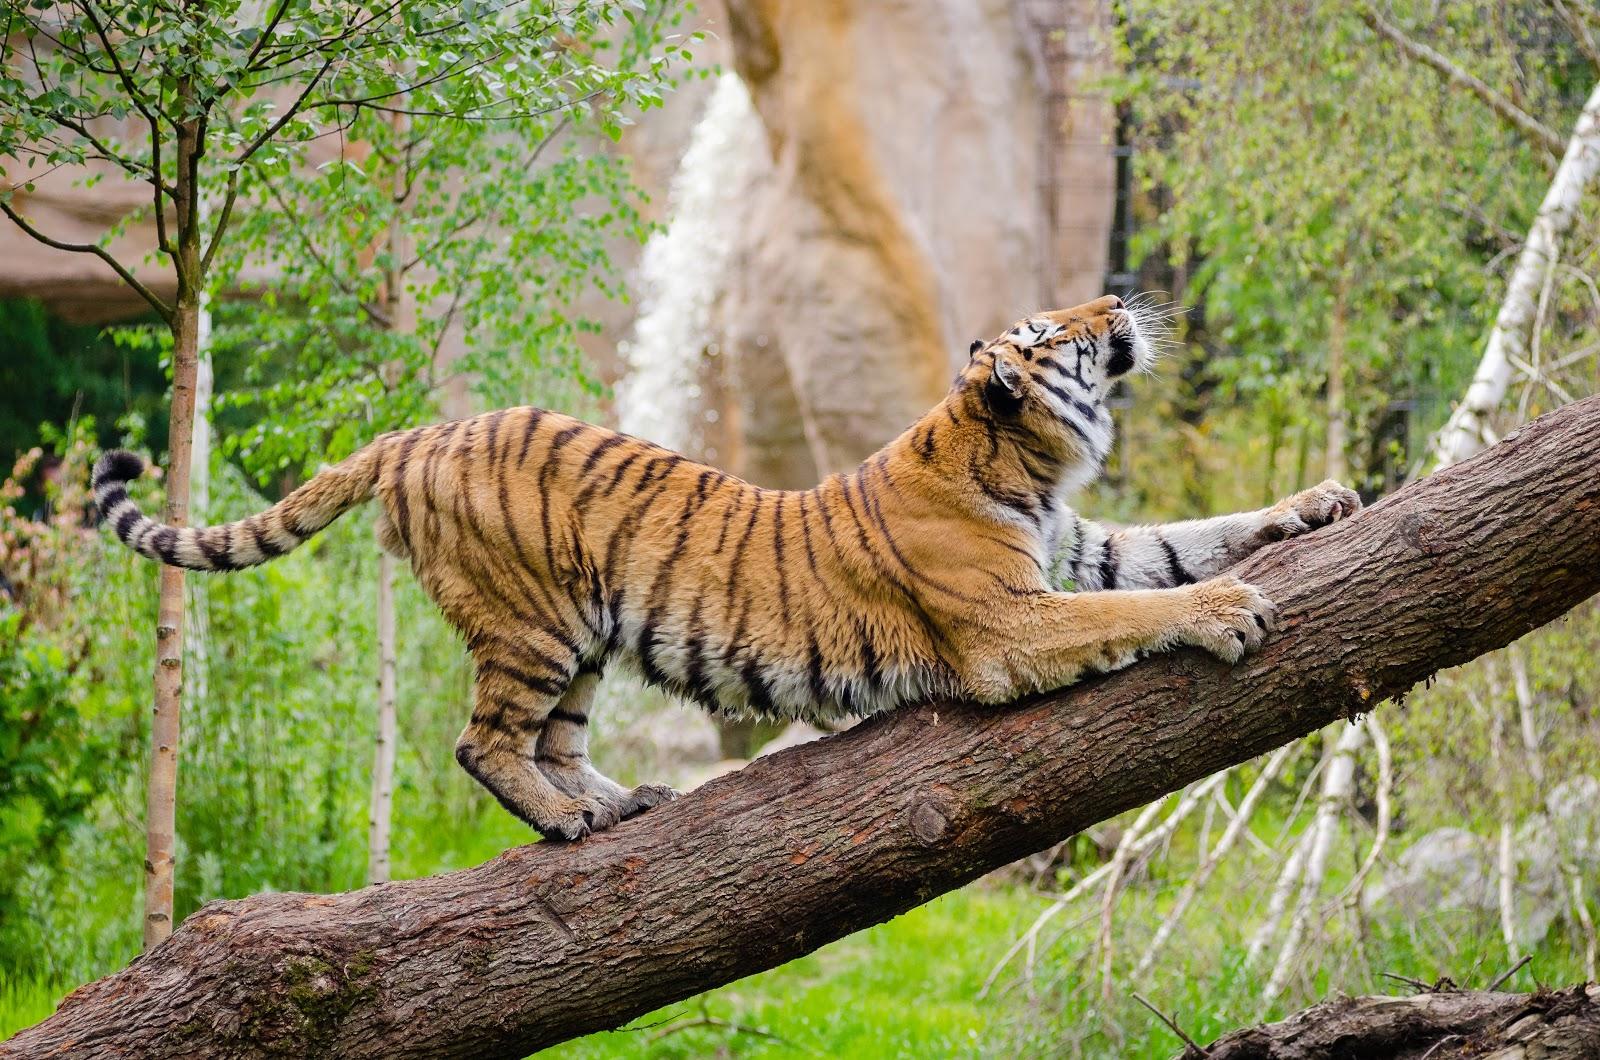 a tiger stretching across a fallen tree trunk